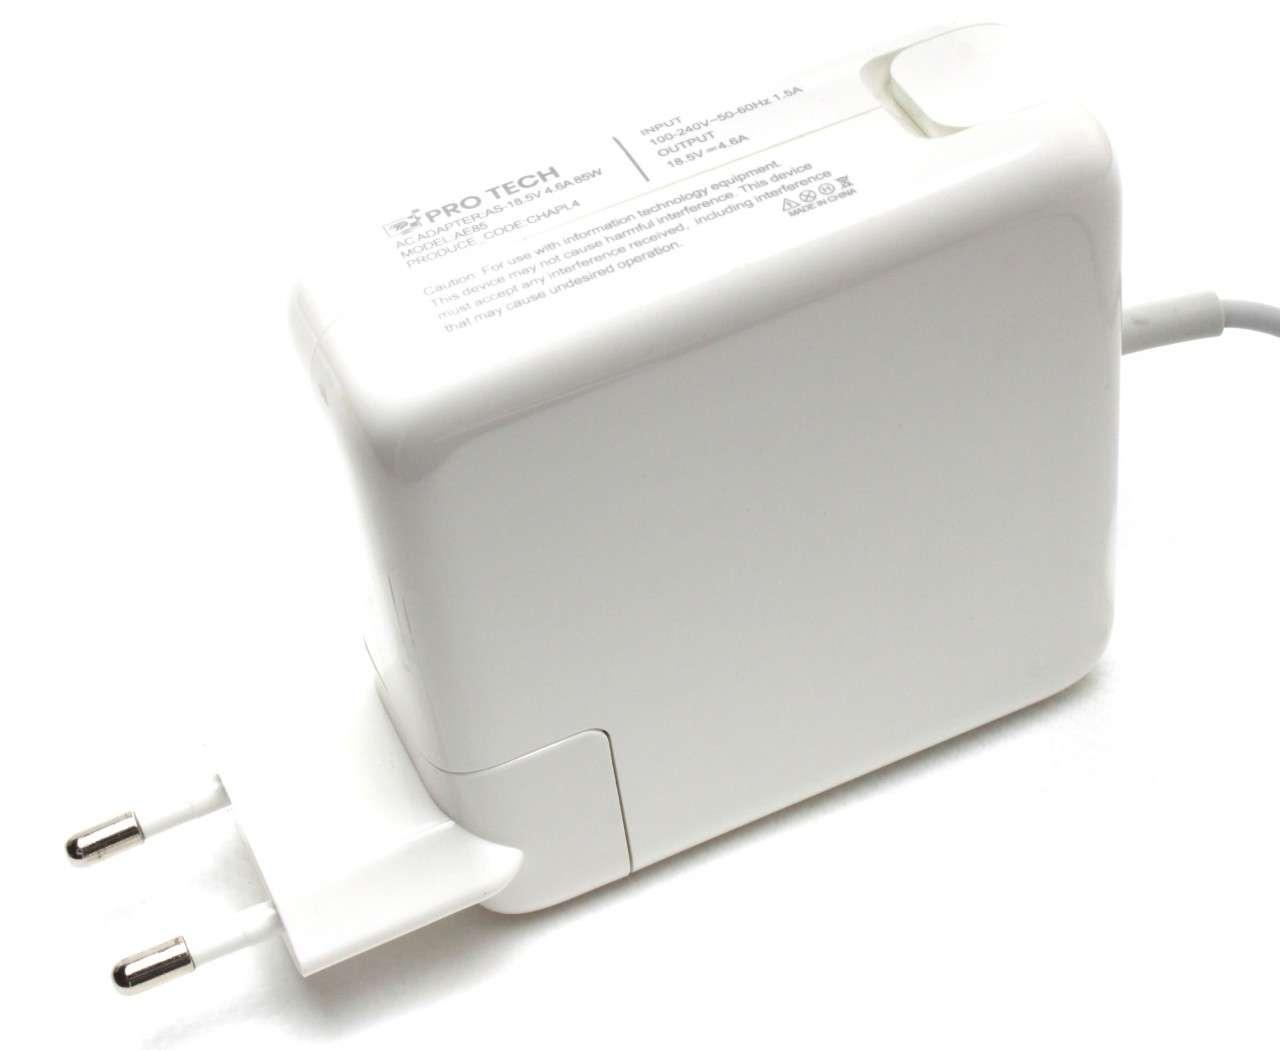 Incarcator Apple MacBook Pro 15 inch Glossy 85W Replacement imagine powerlaptop.ro 2021